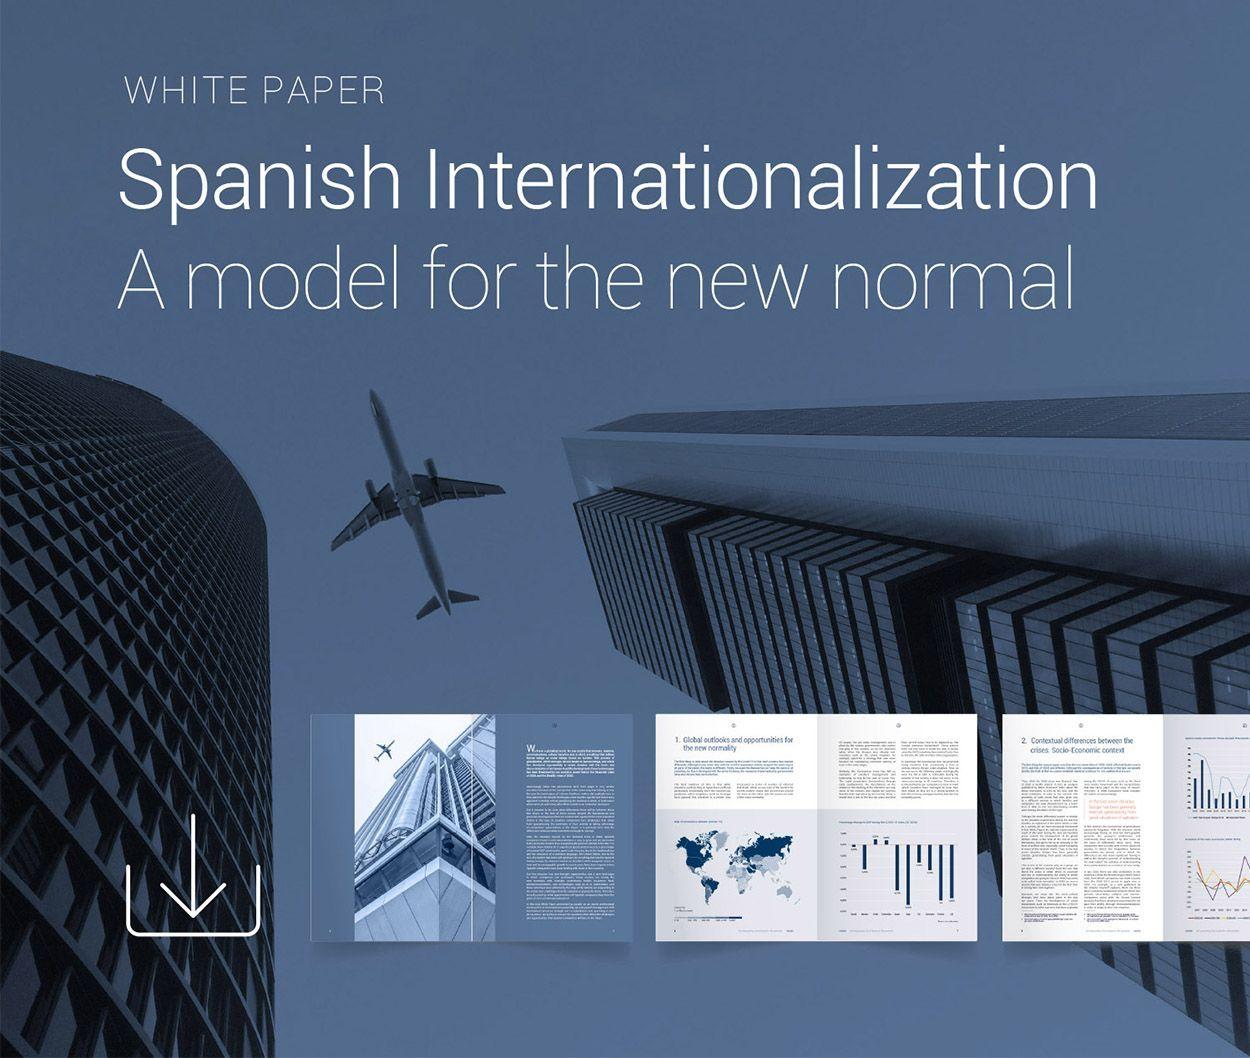 Spanish internationalitation